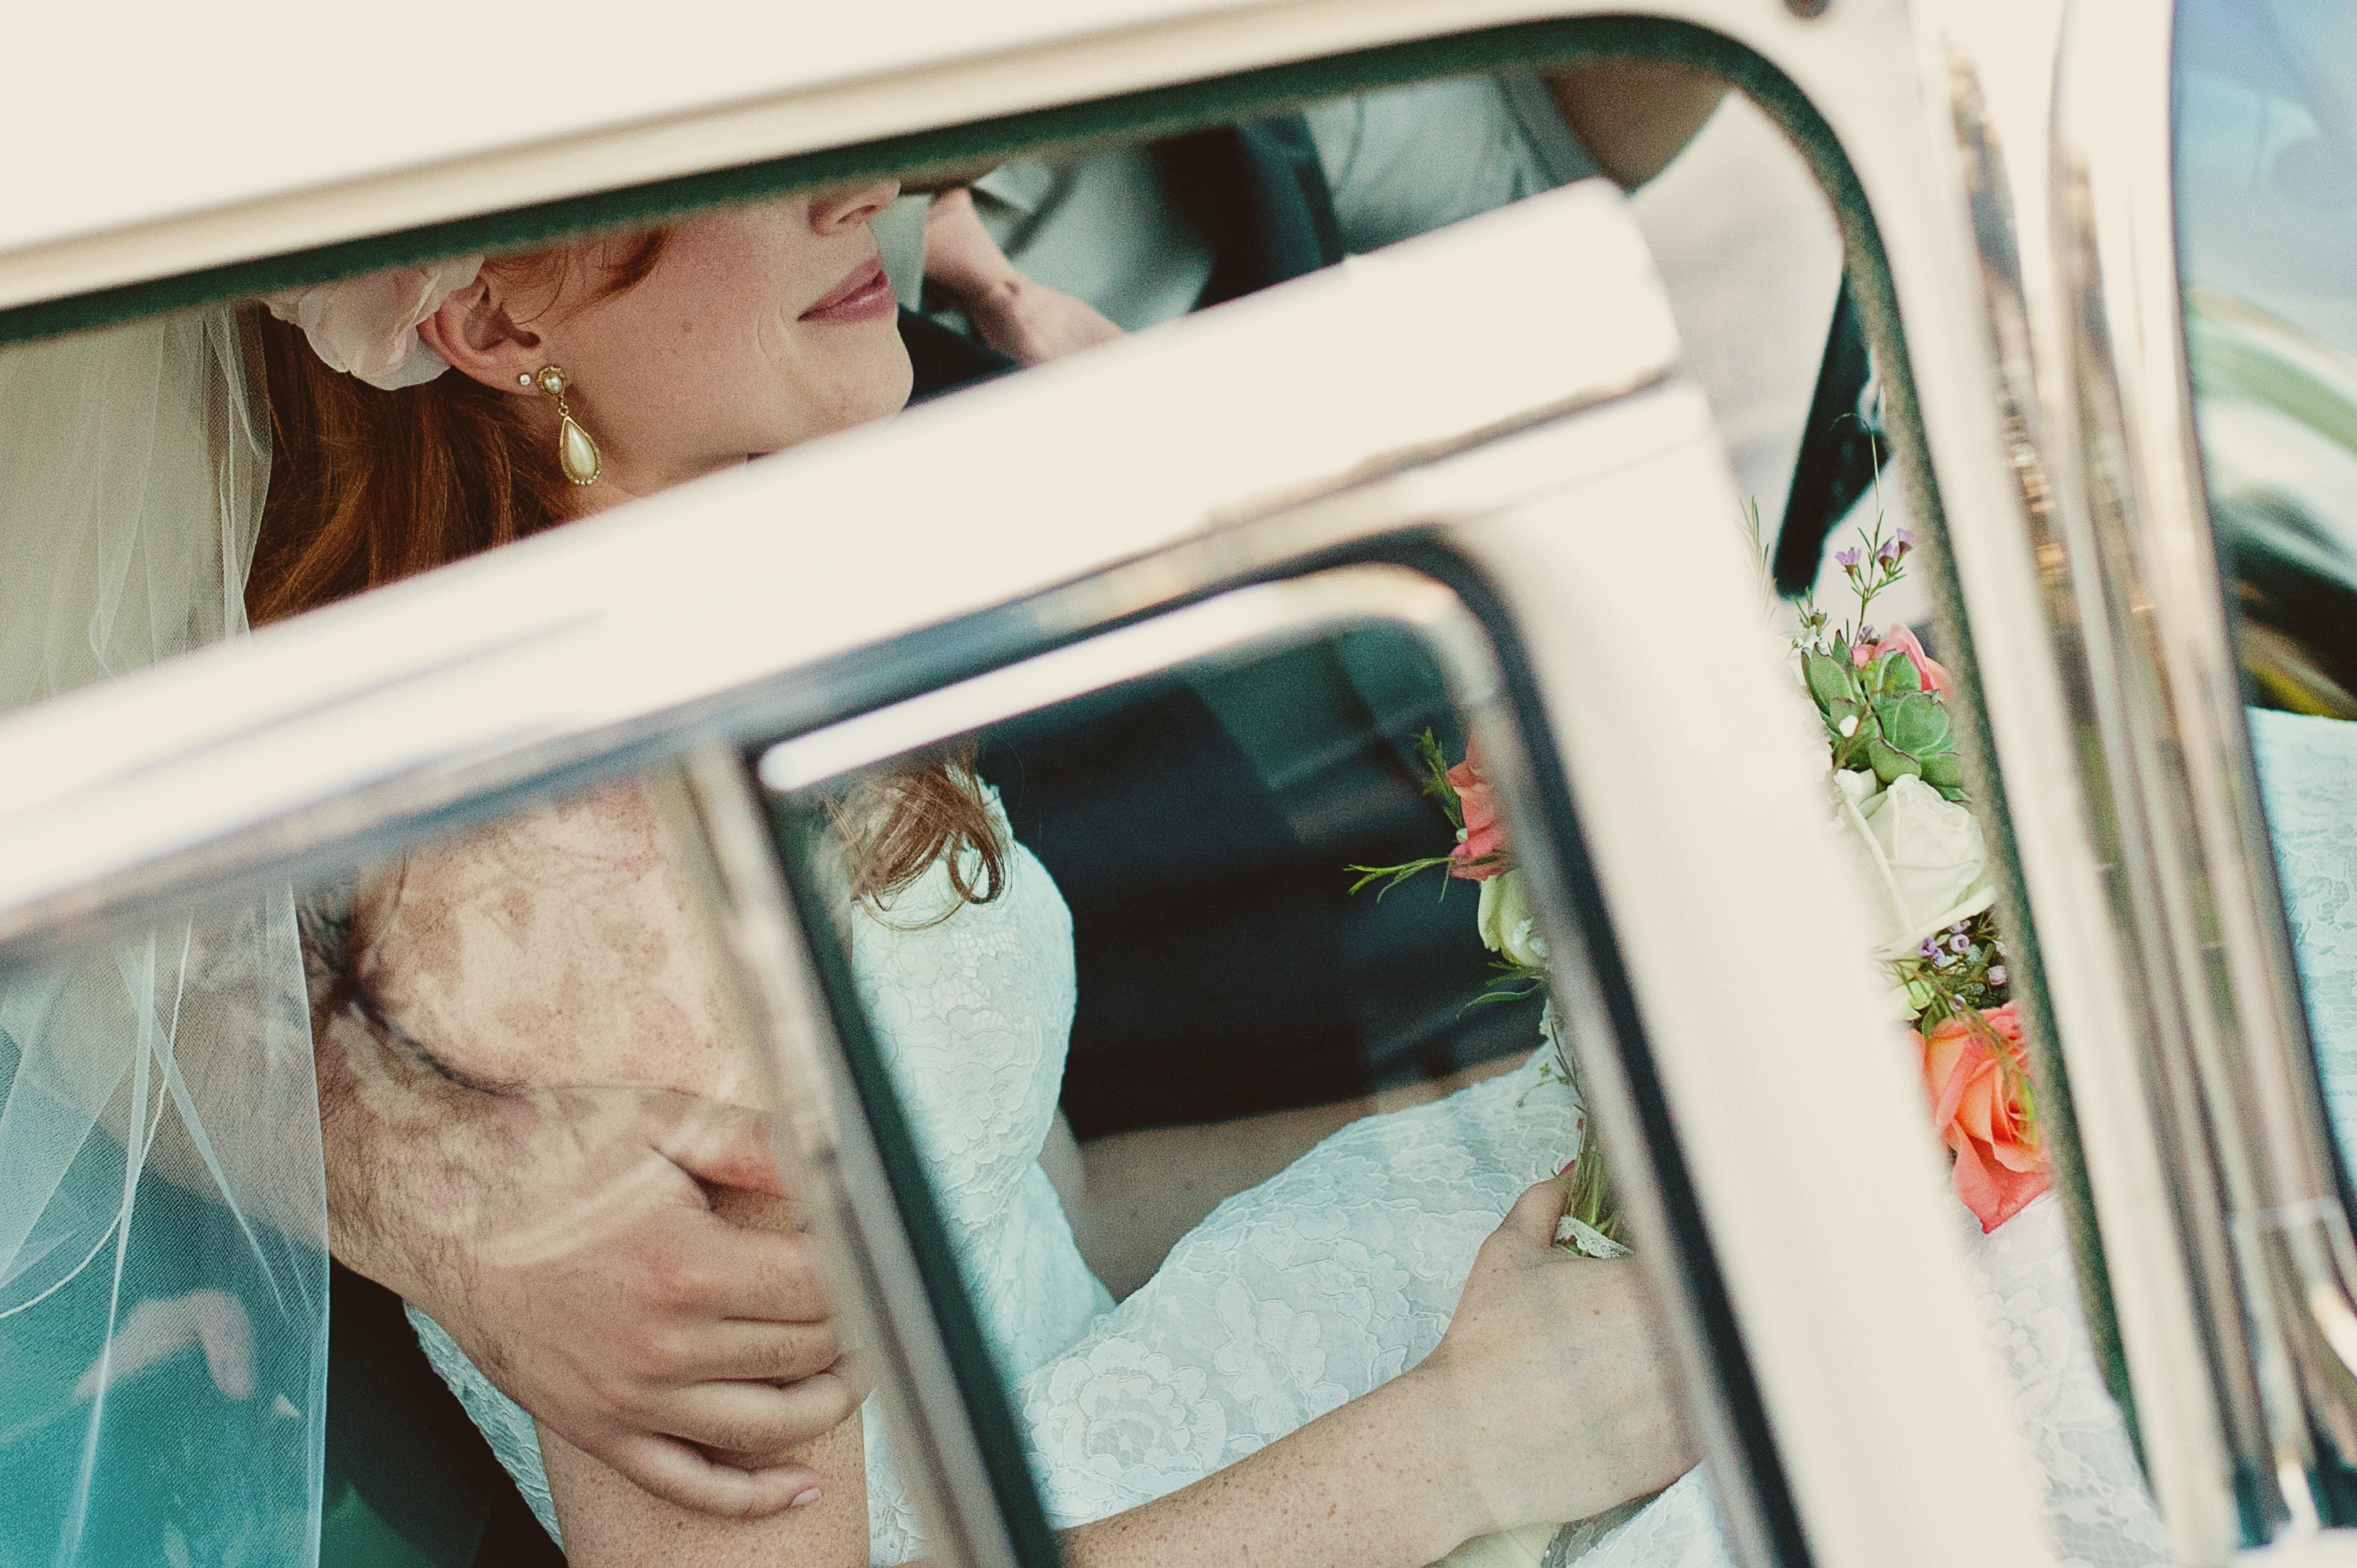 Bridal couple inside a car prepares for their honeymoon